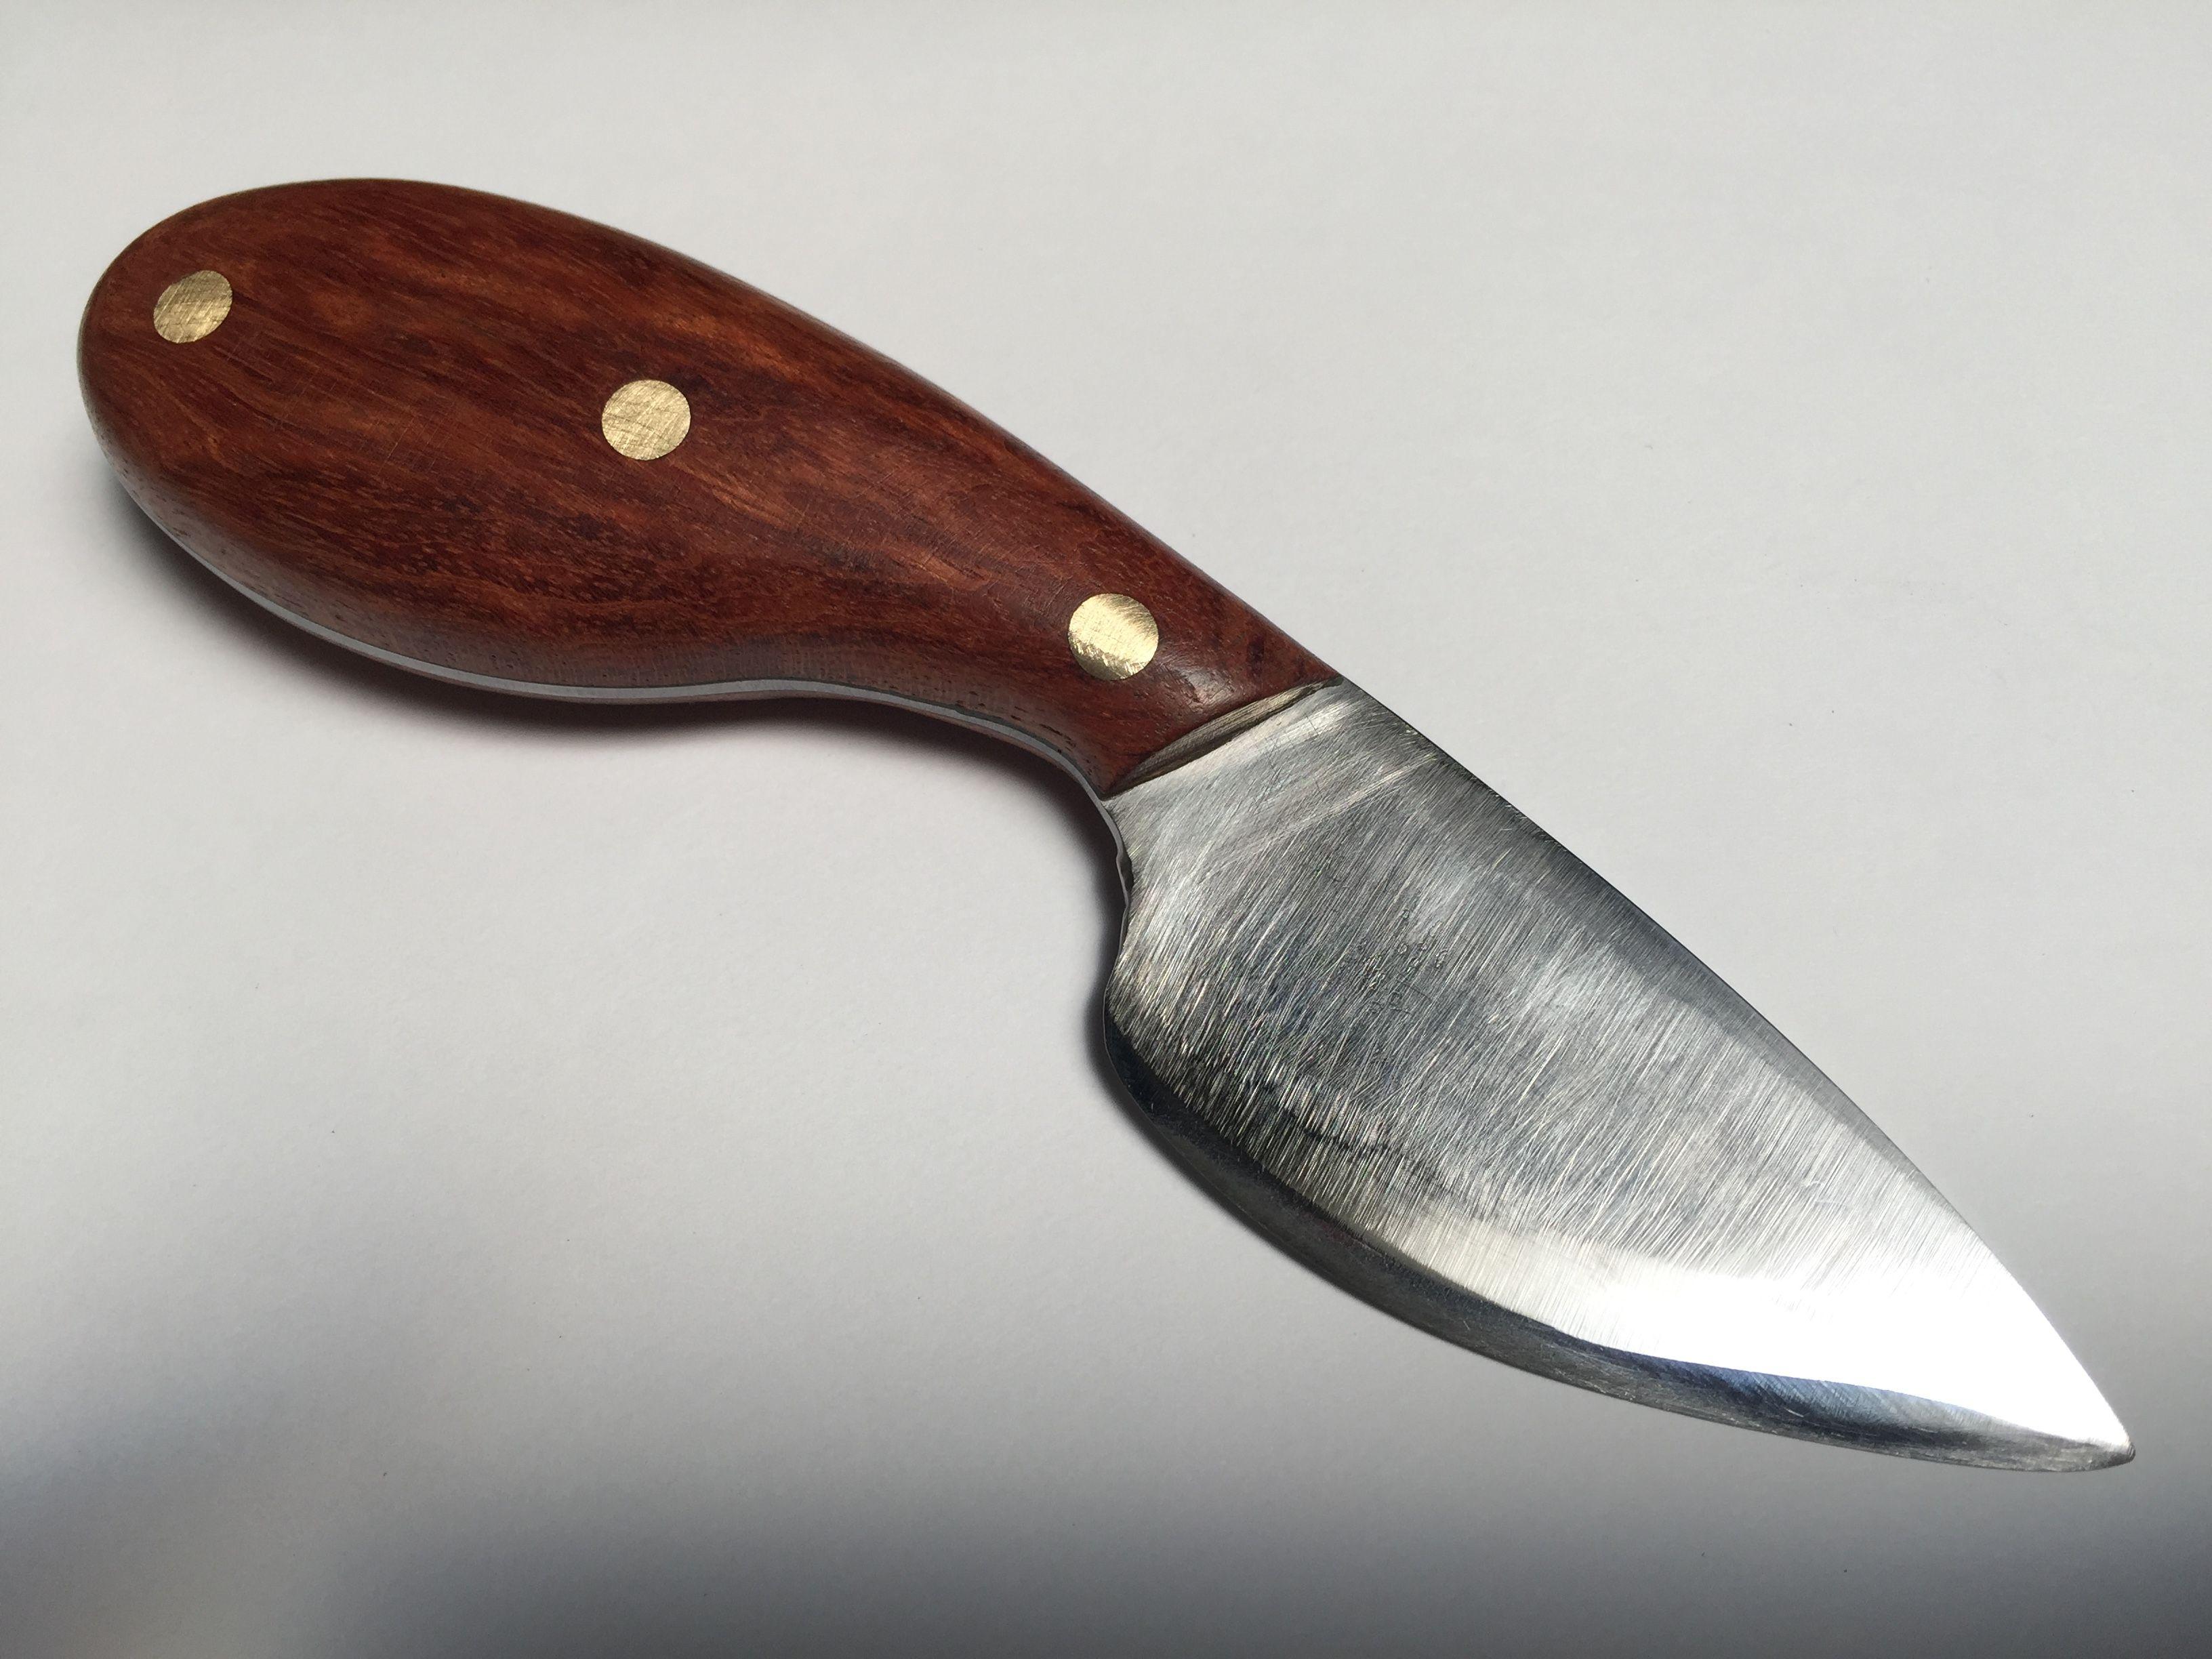 Diy Cheese Knife From Old Sawblade Cuchillos